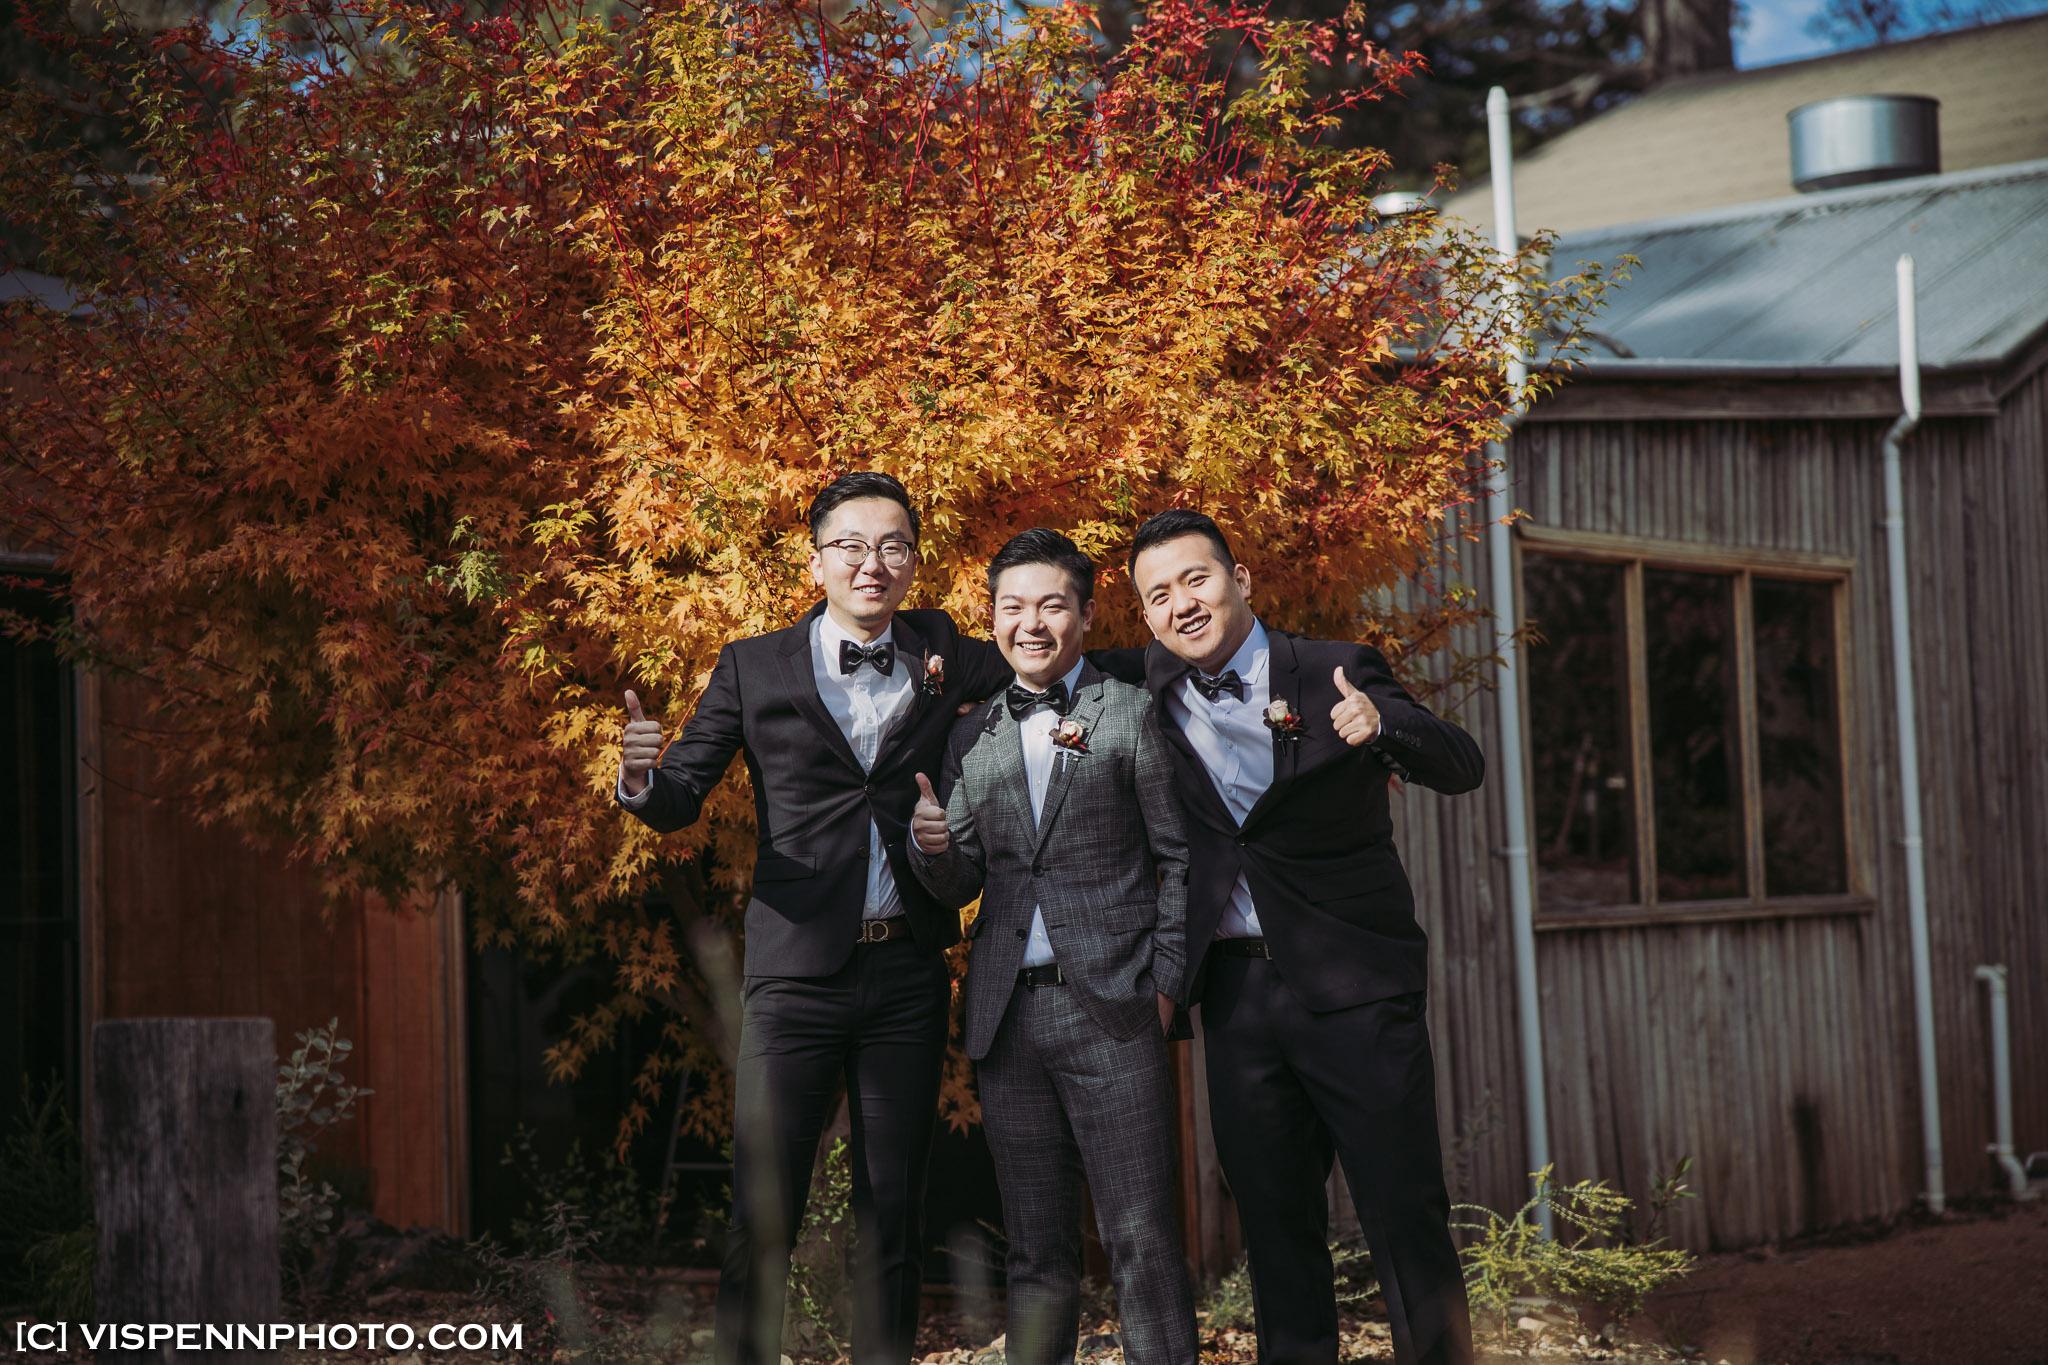 WEDDING DAY Photography Melbourne VISPENN 墨尔本 婚礼跟拍 婚礼摄像 婚礼摄影 结婚照 登记照 DominicHelen 1P 1905 EOSR VISPENN